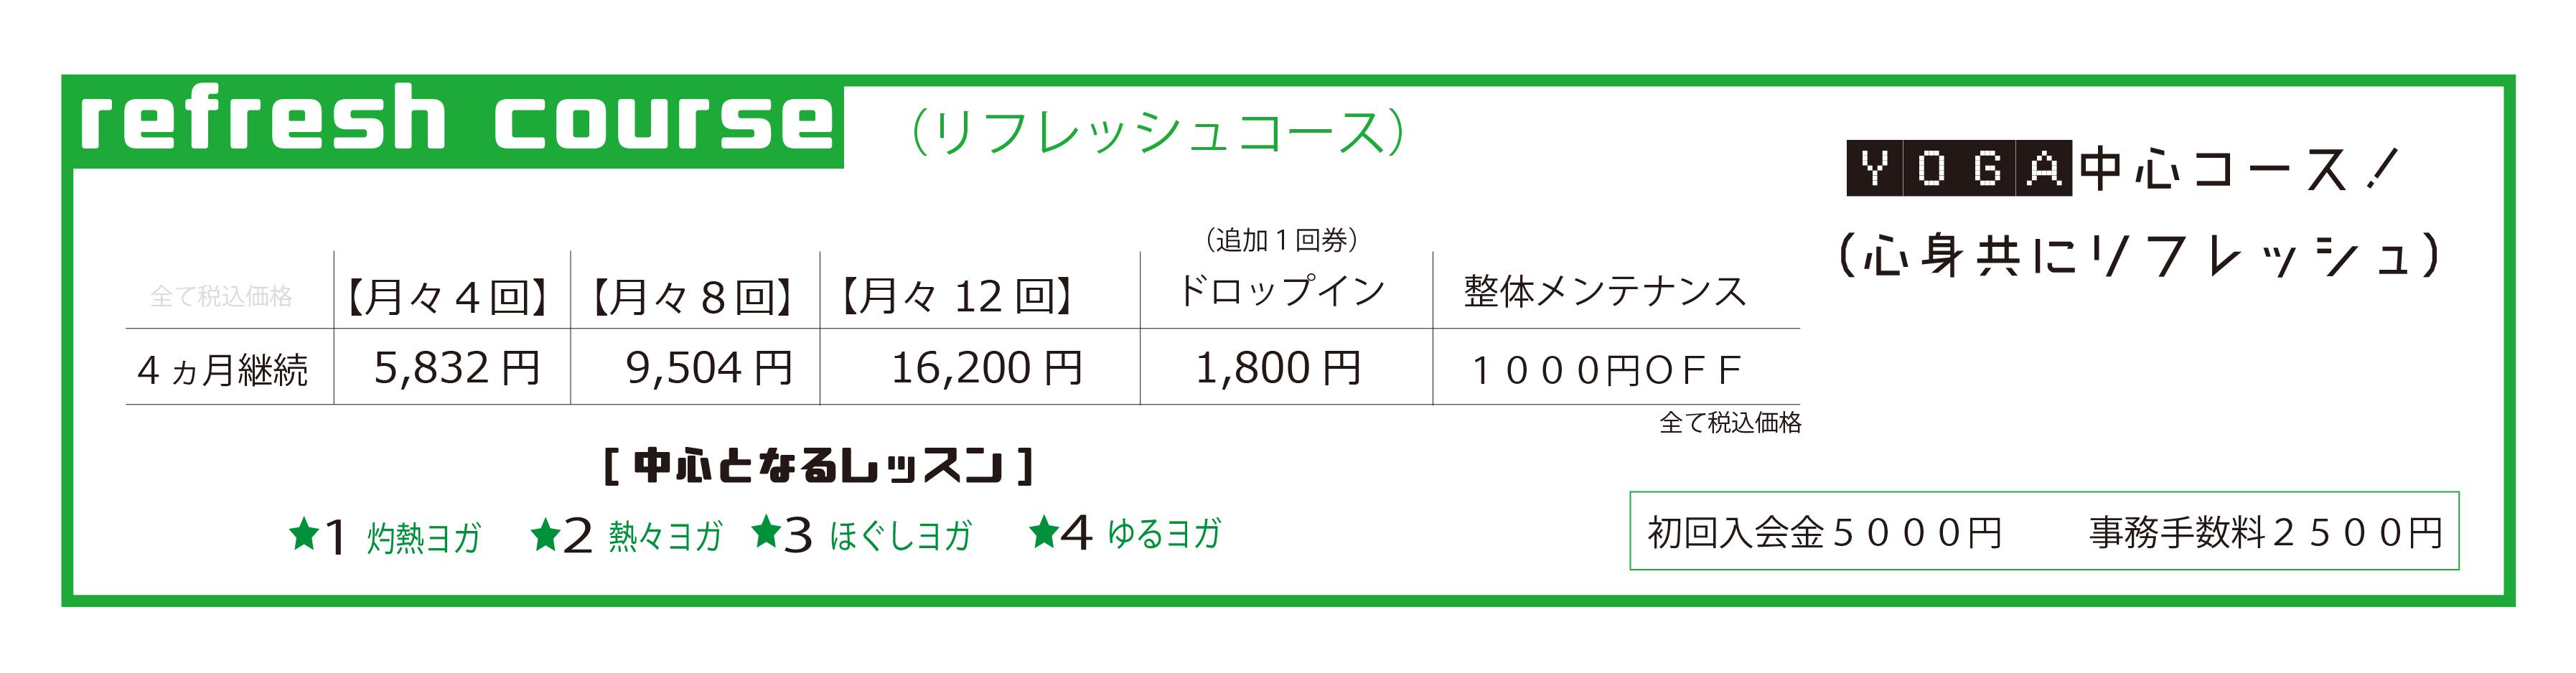 price list-04